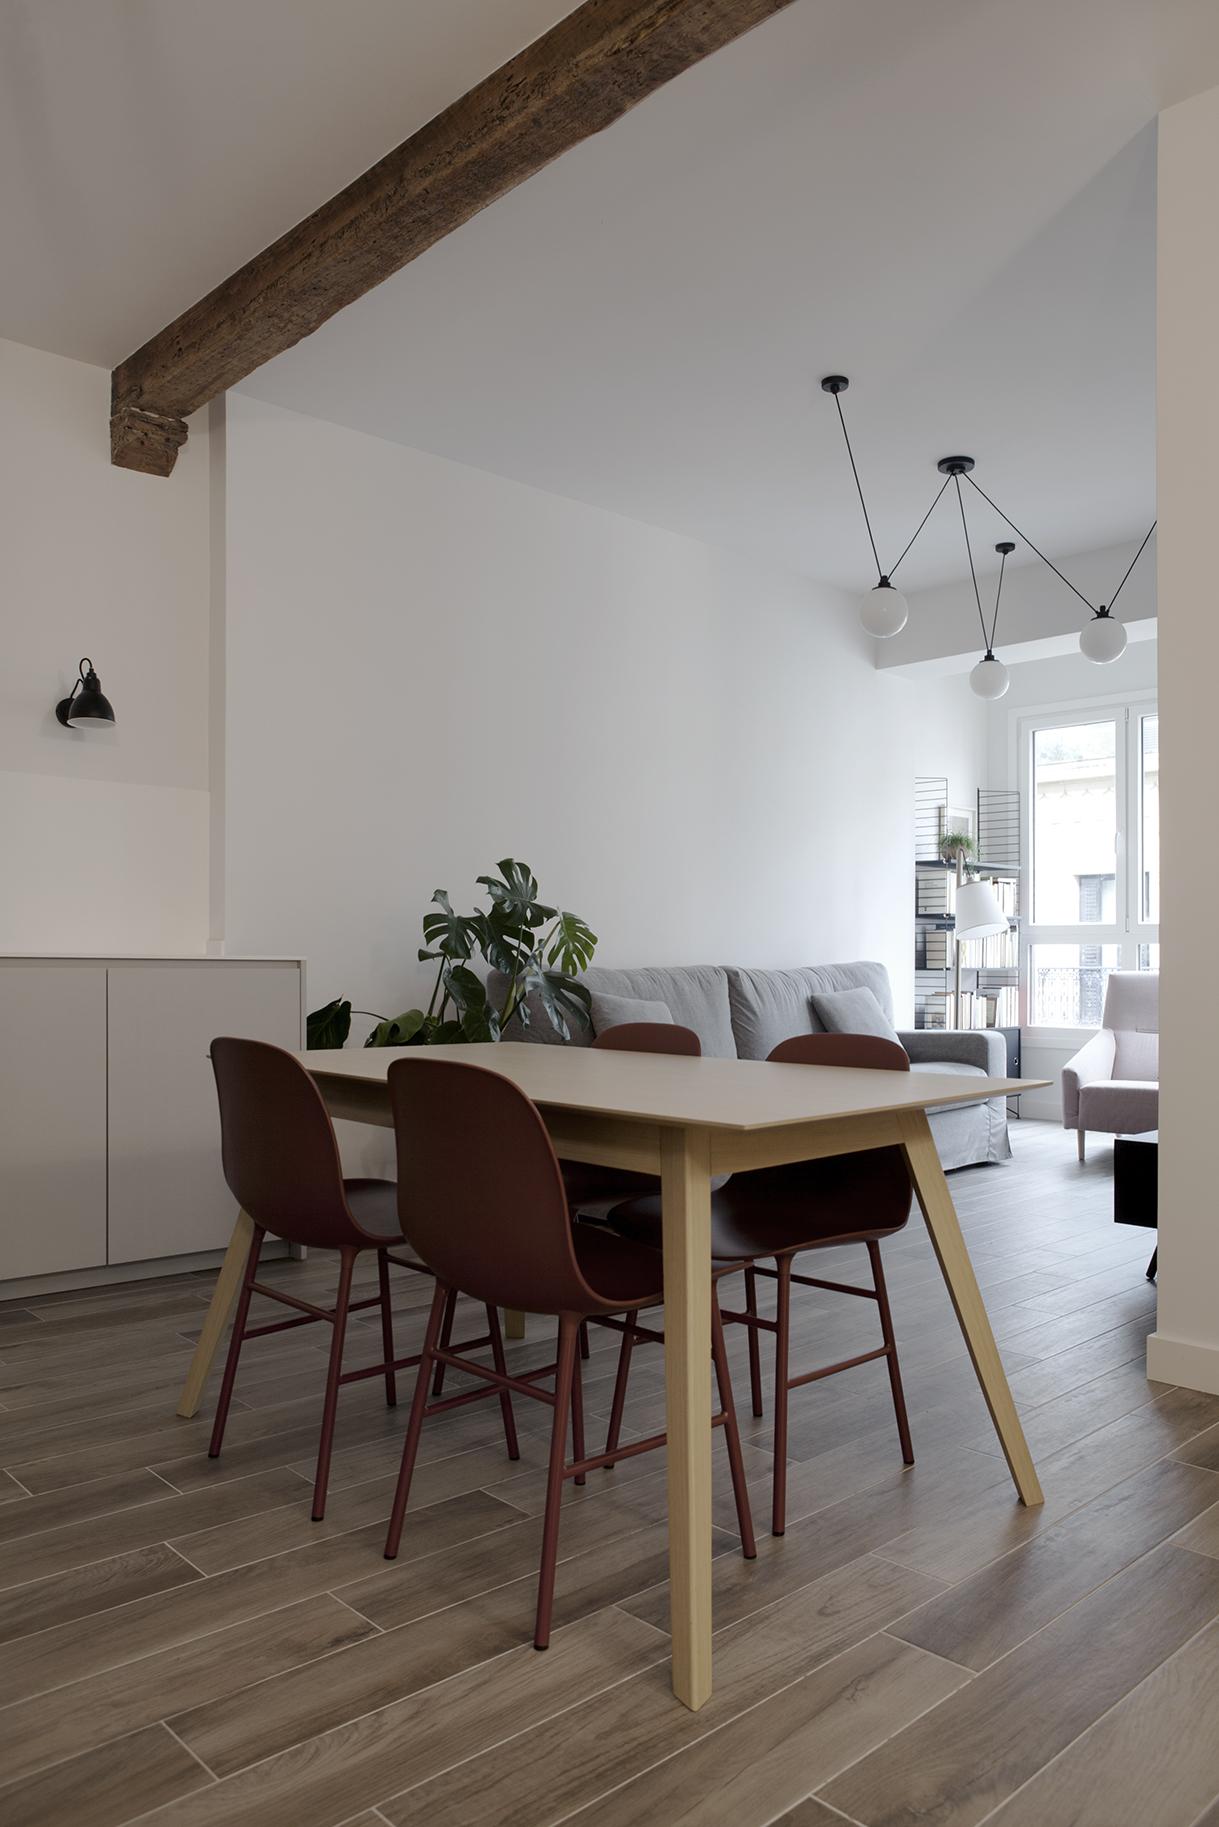 vivienda-Kresala-Donostia-2017-02